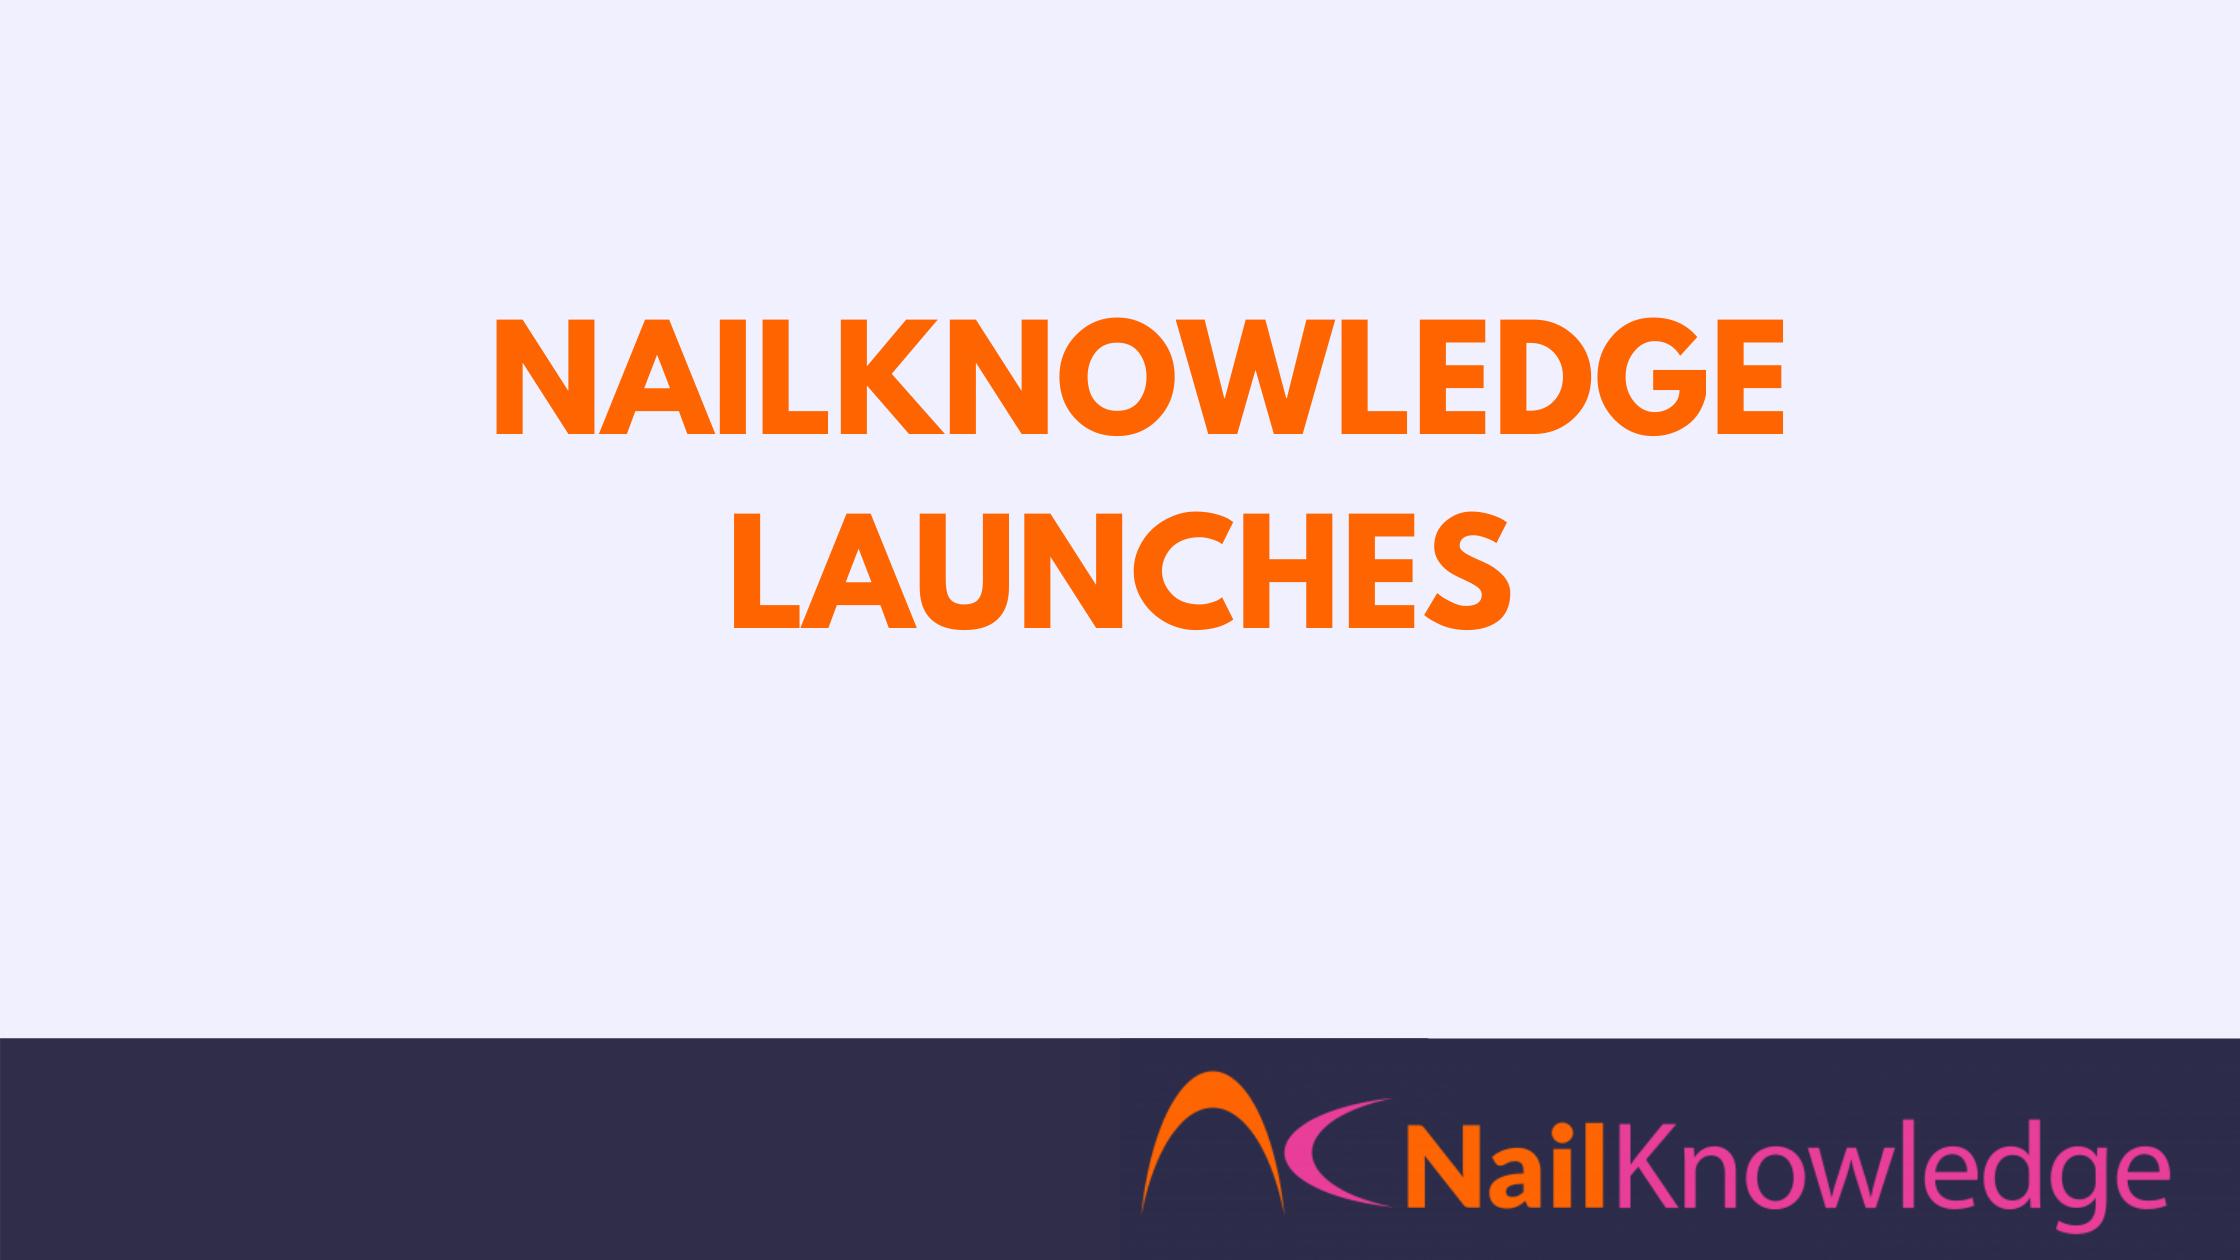 Are you an aspiring Nail Technician?